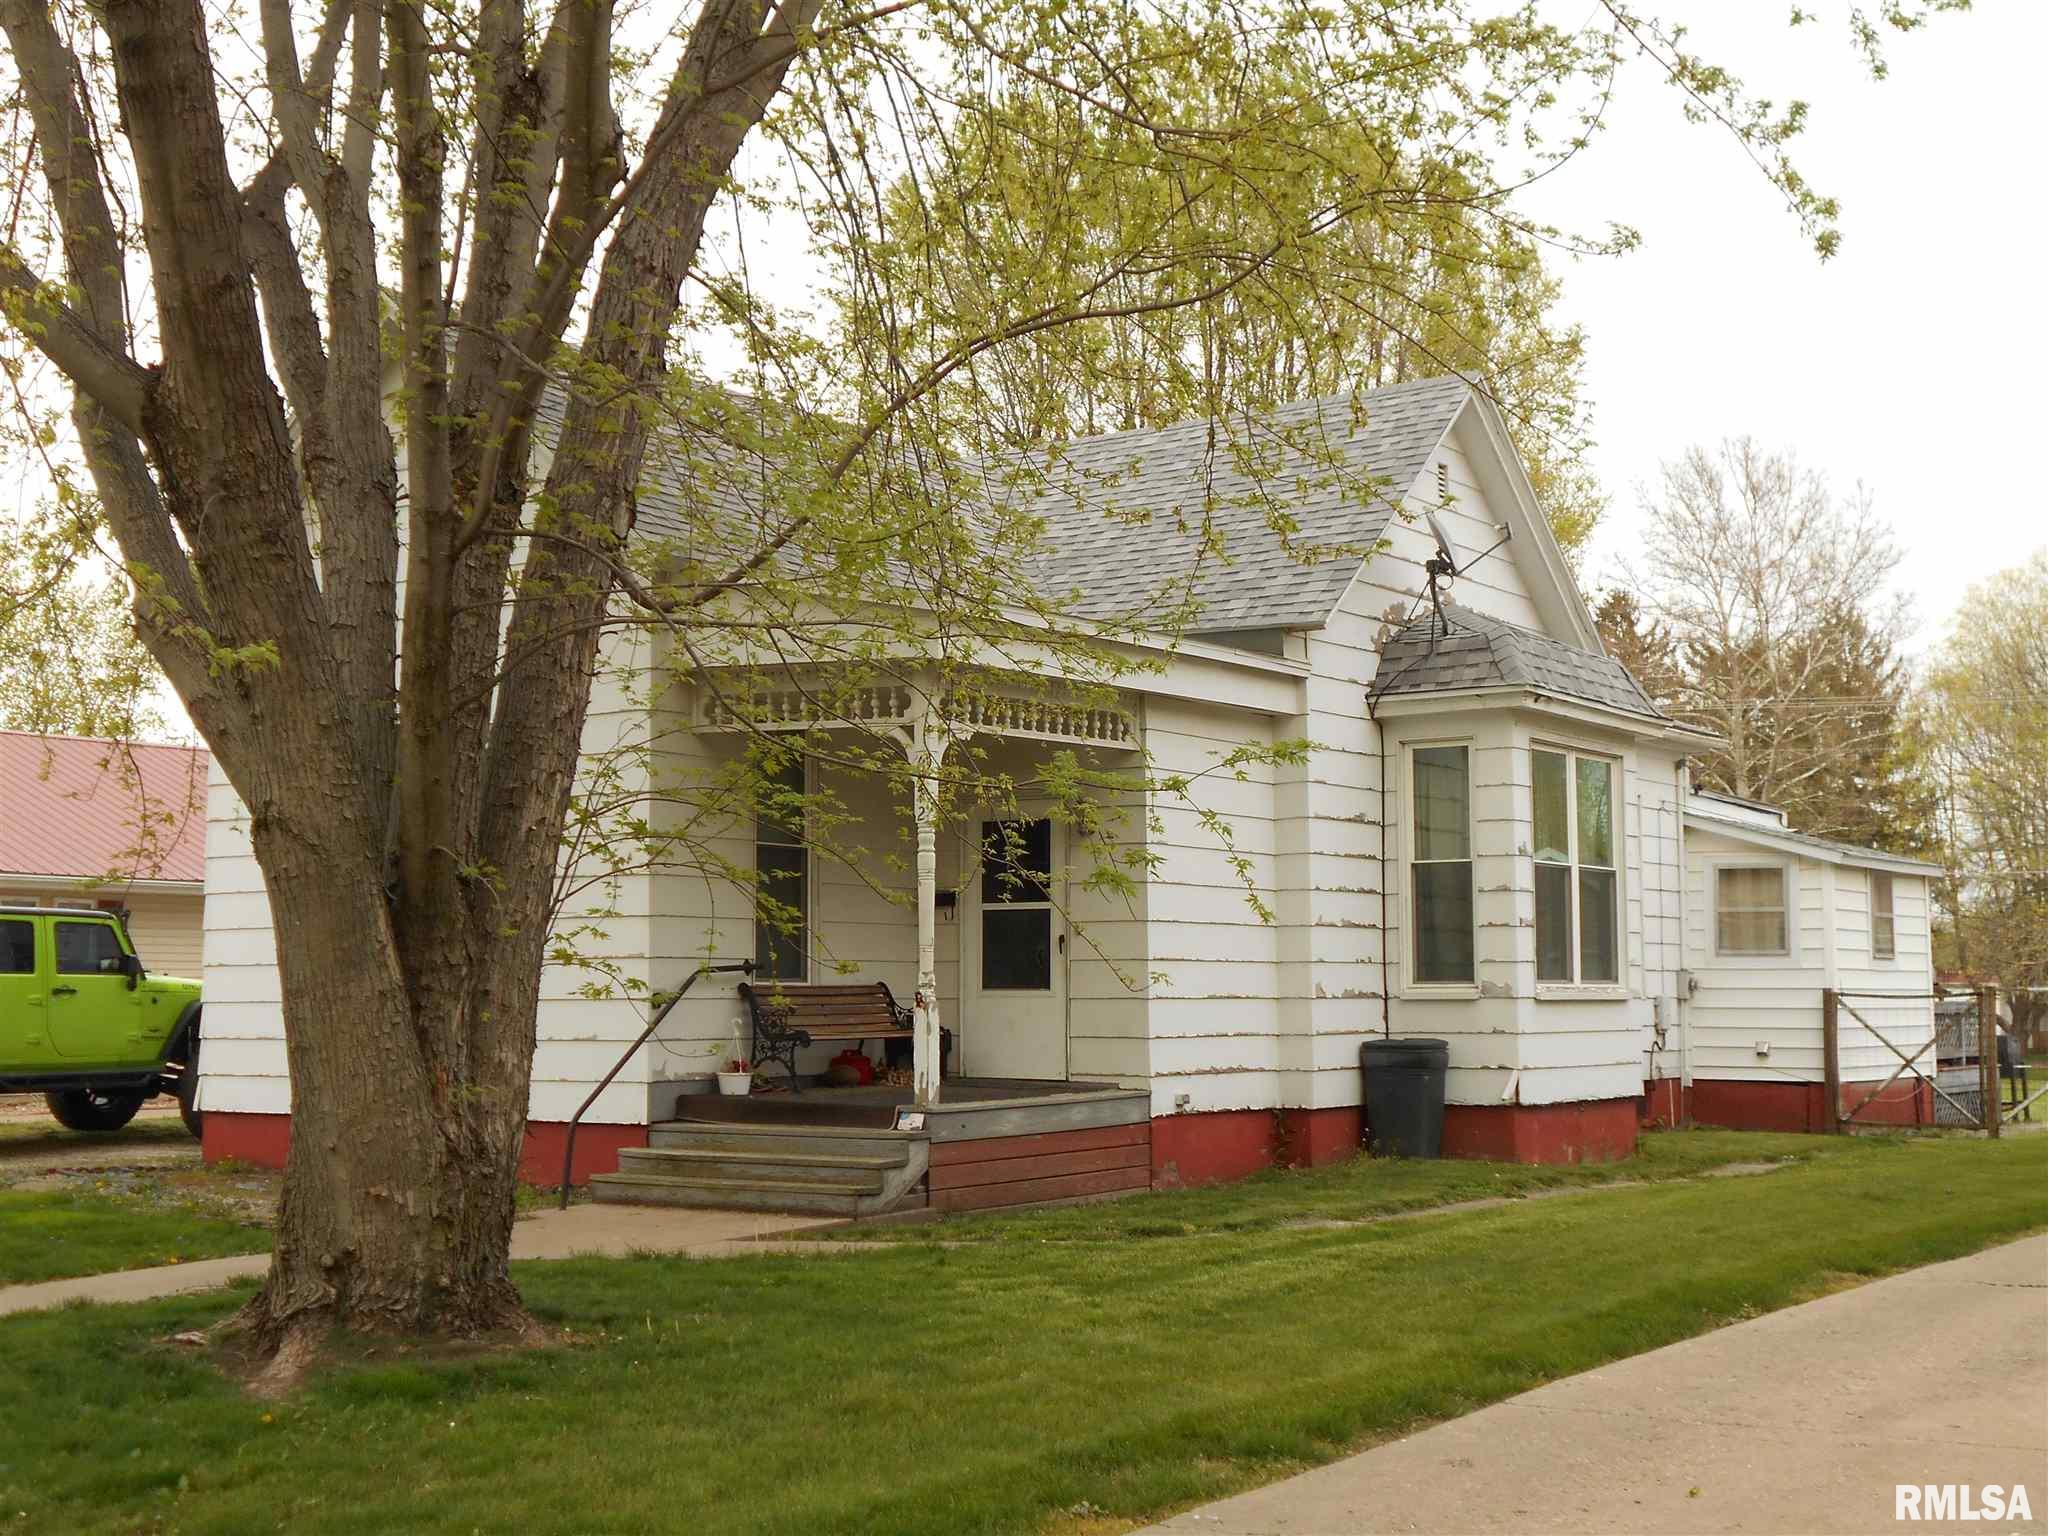 642 N Rile Property Photo - Bushnell, IL real estate listing